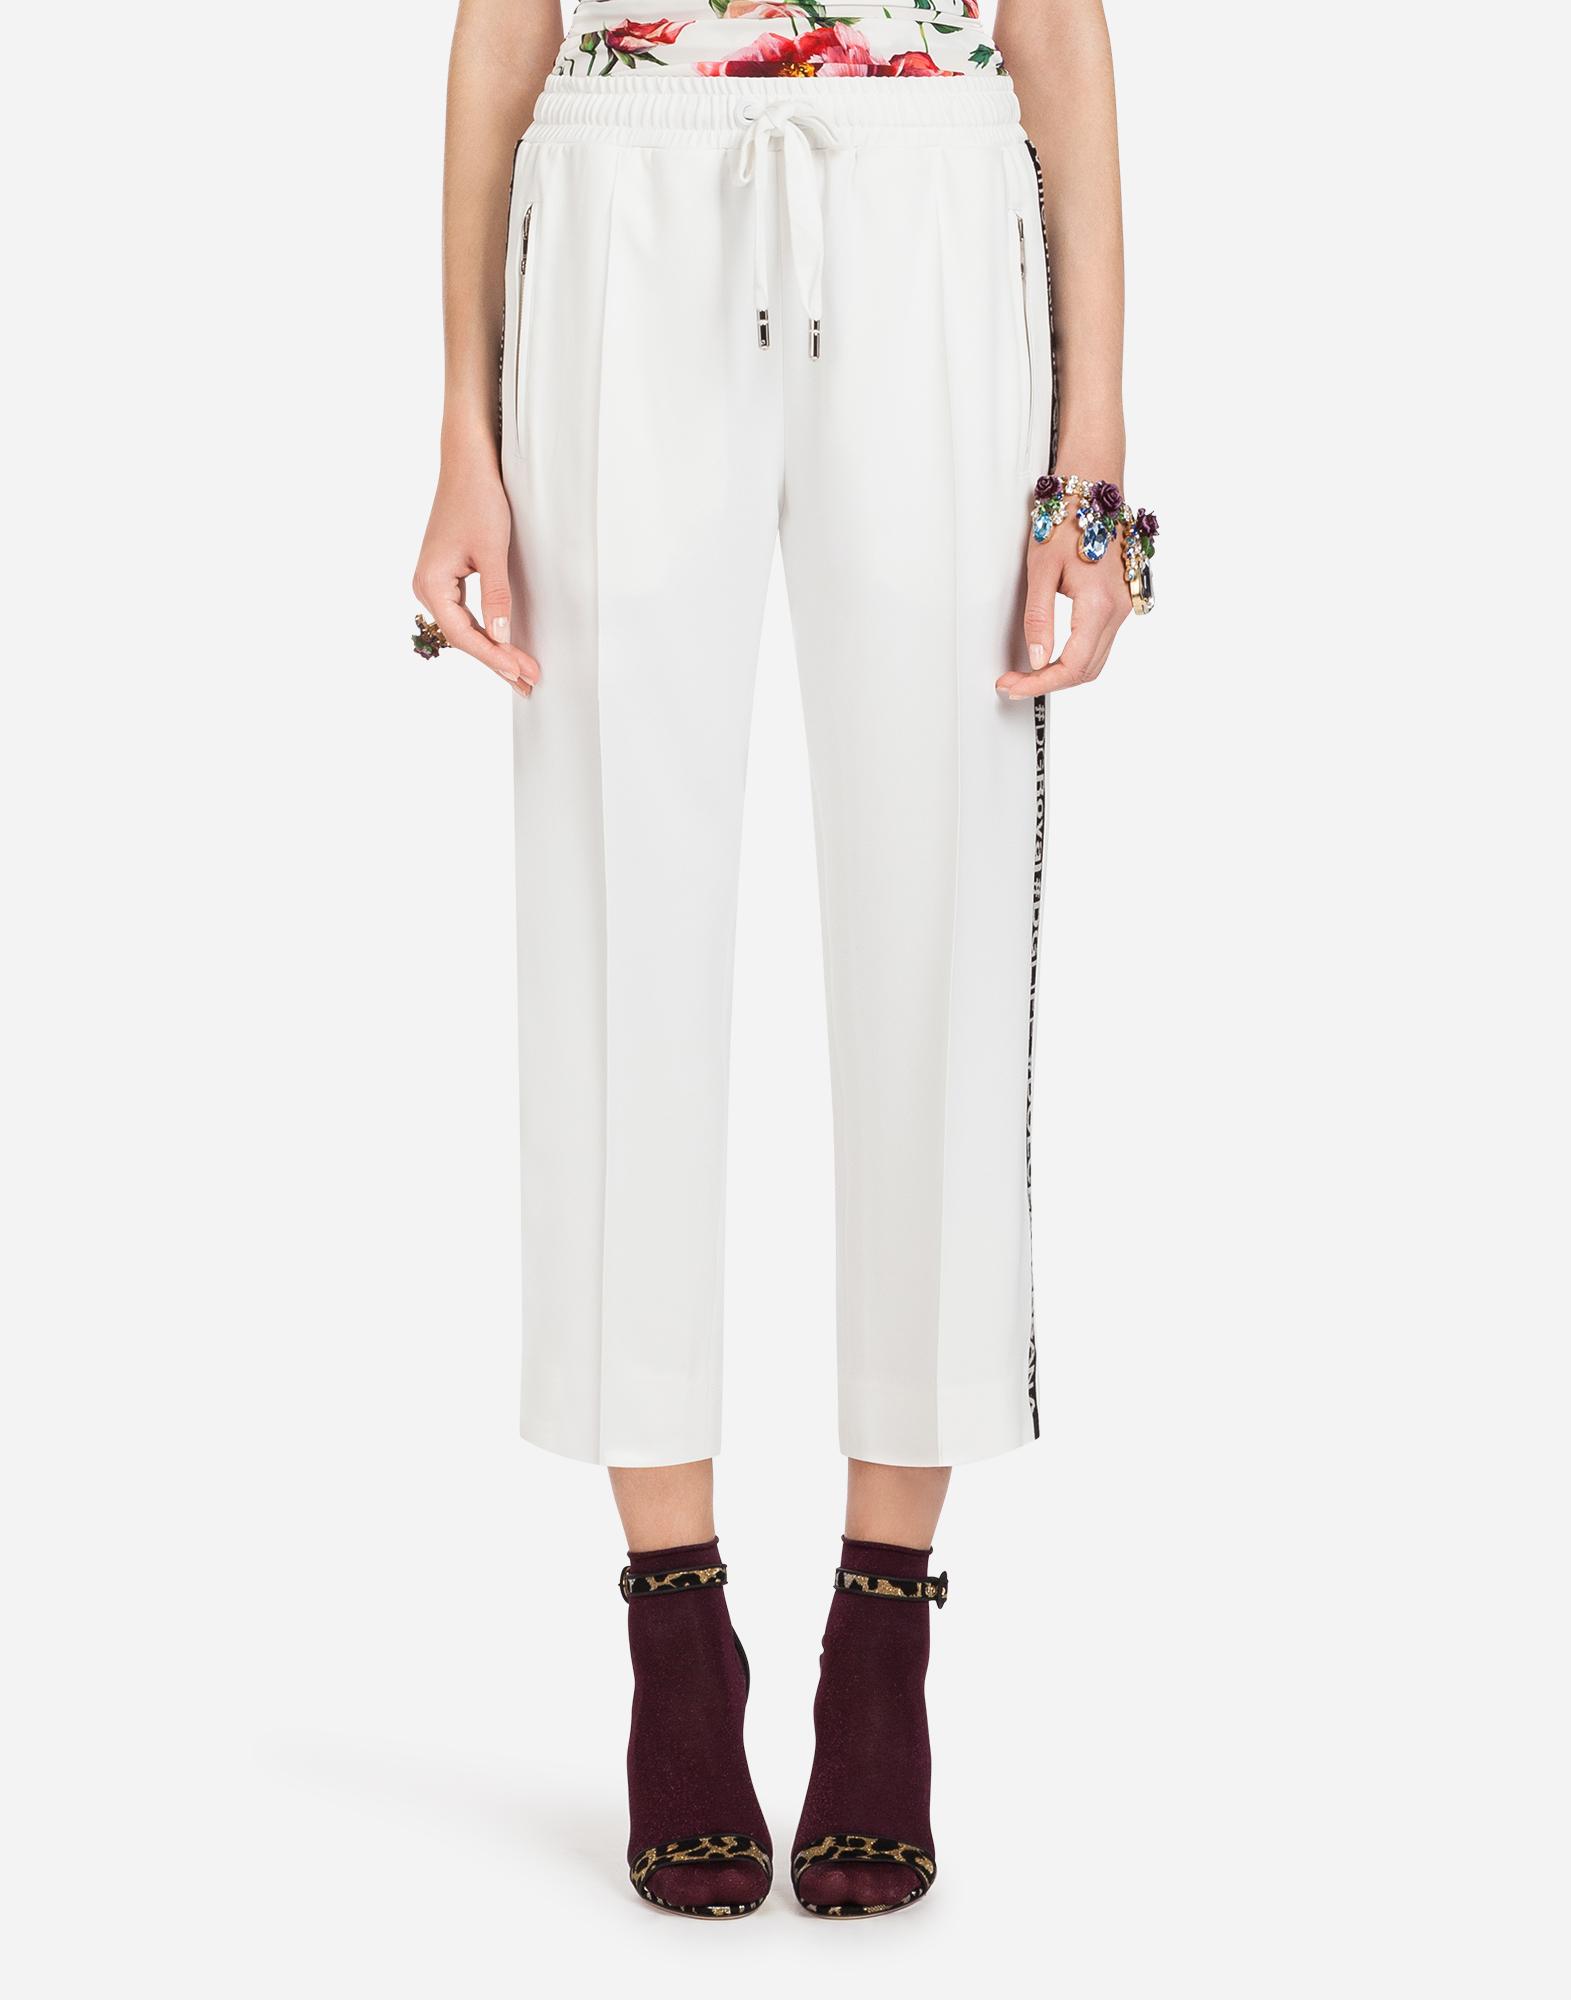 Dolce & Gabbana CADY JOGGING PANTS